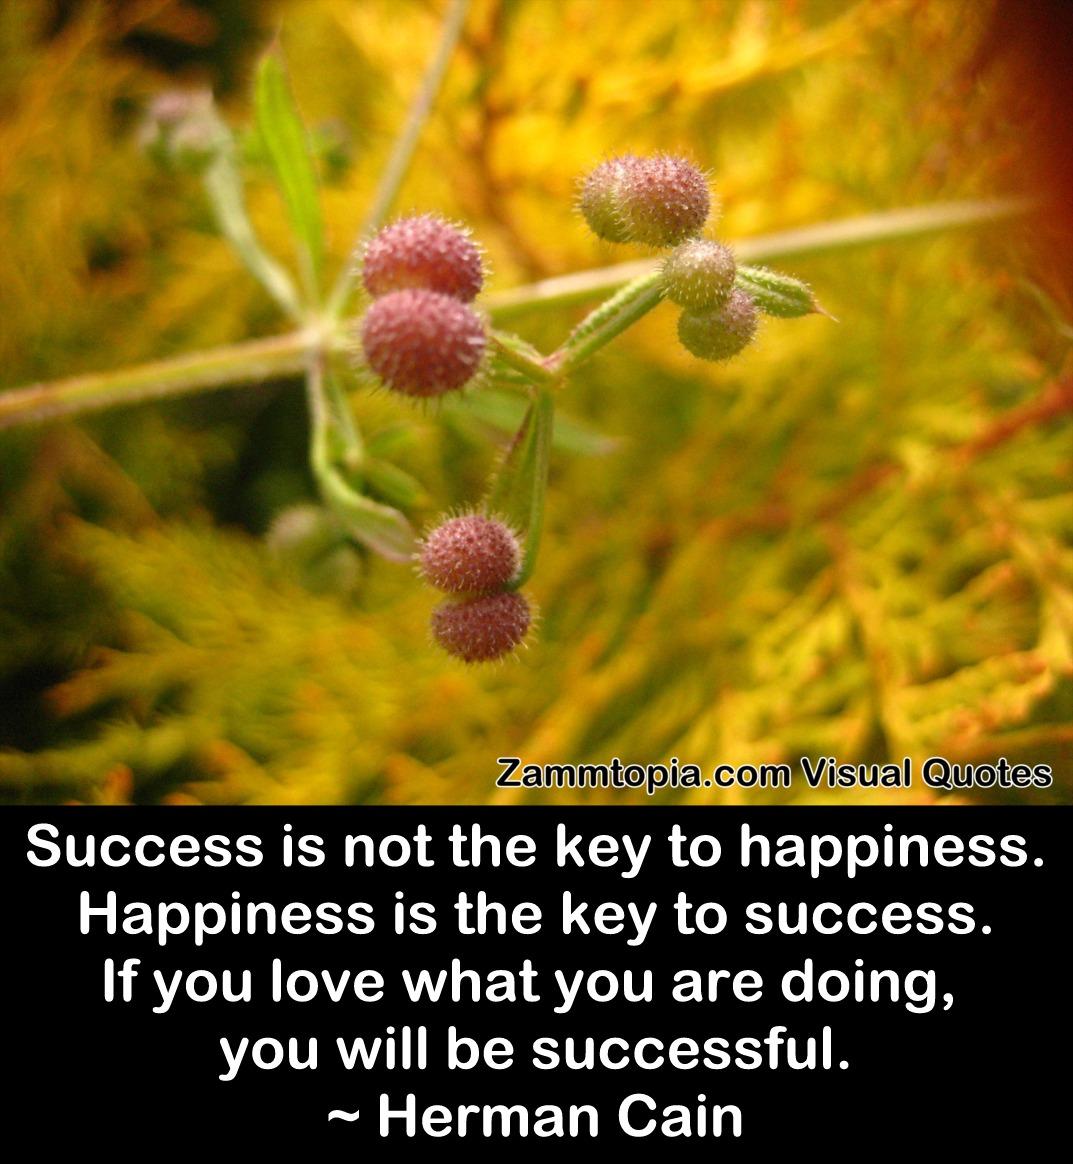 Herman Cain on Success